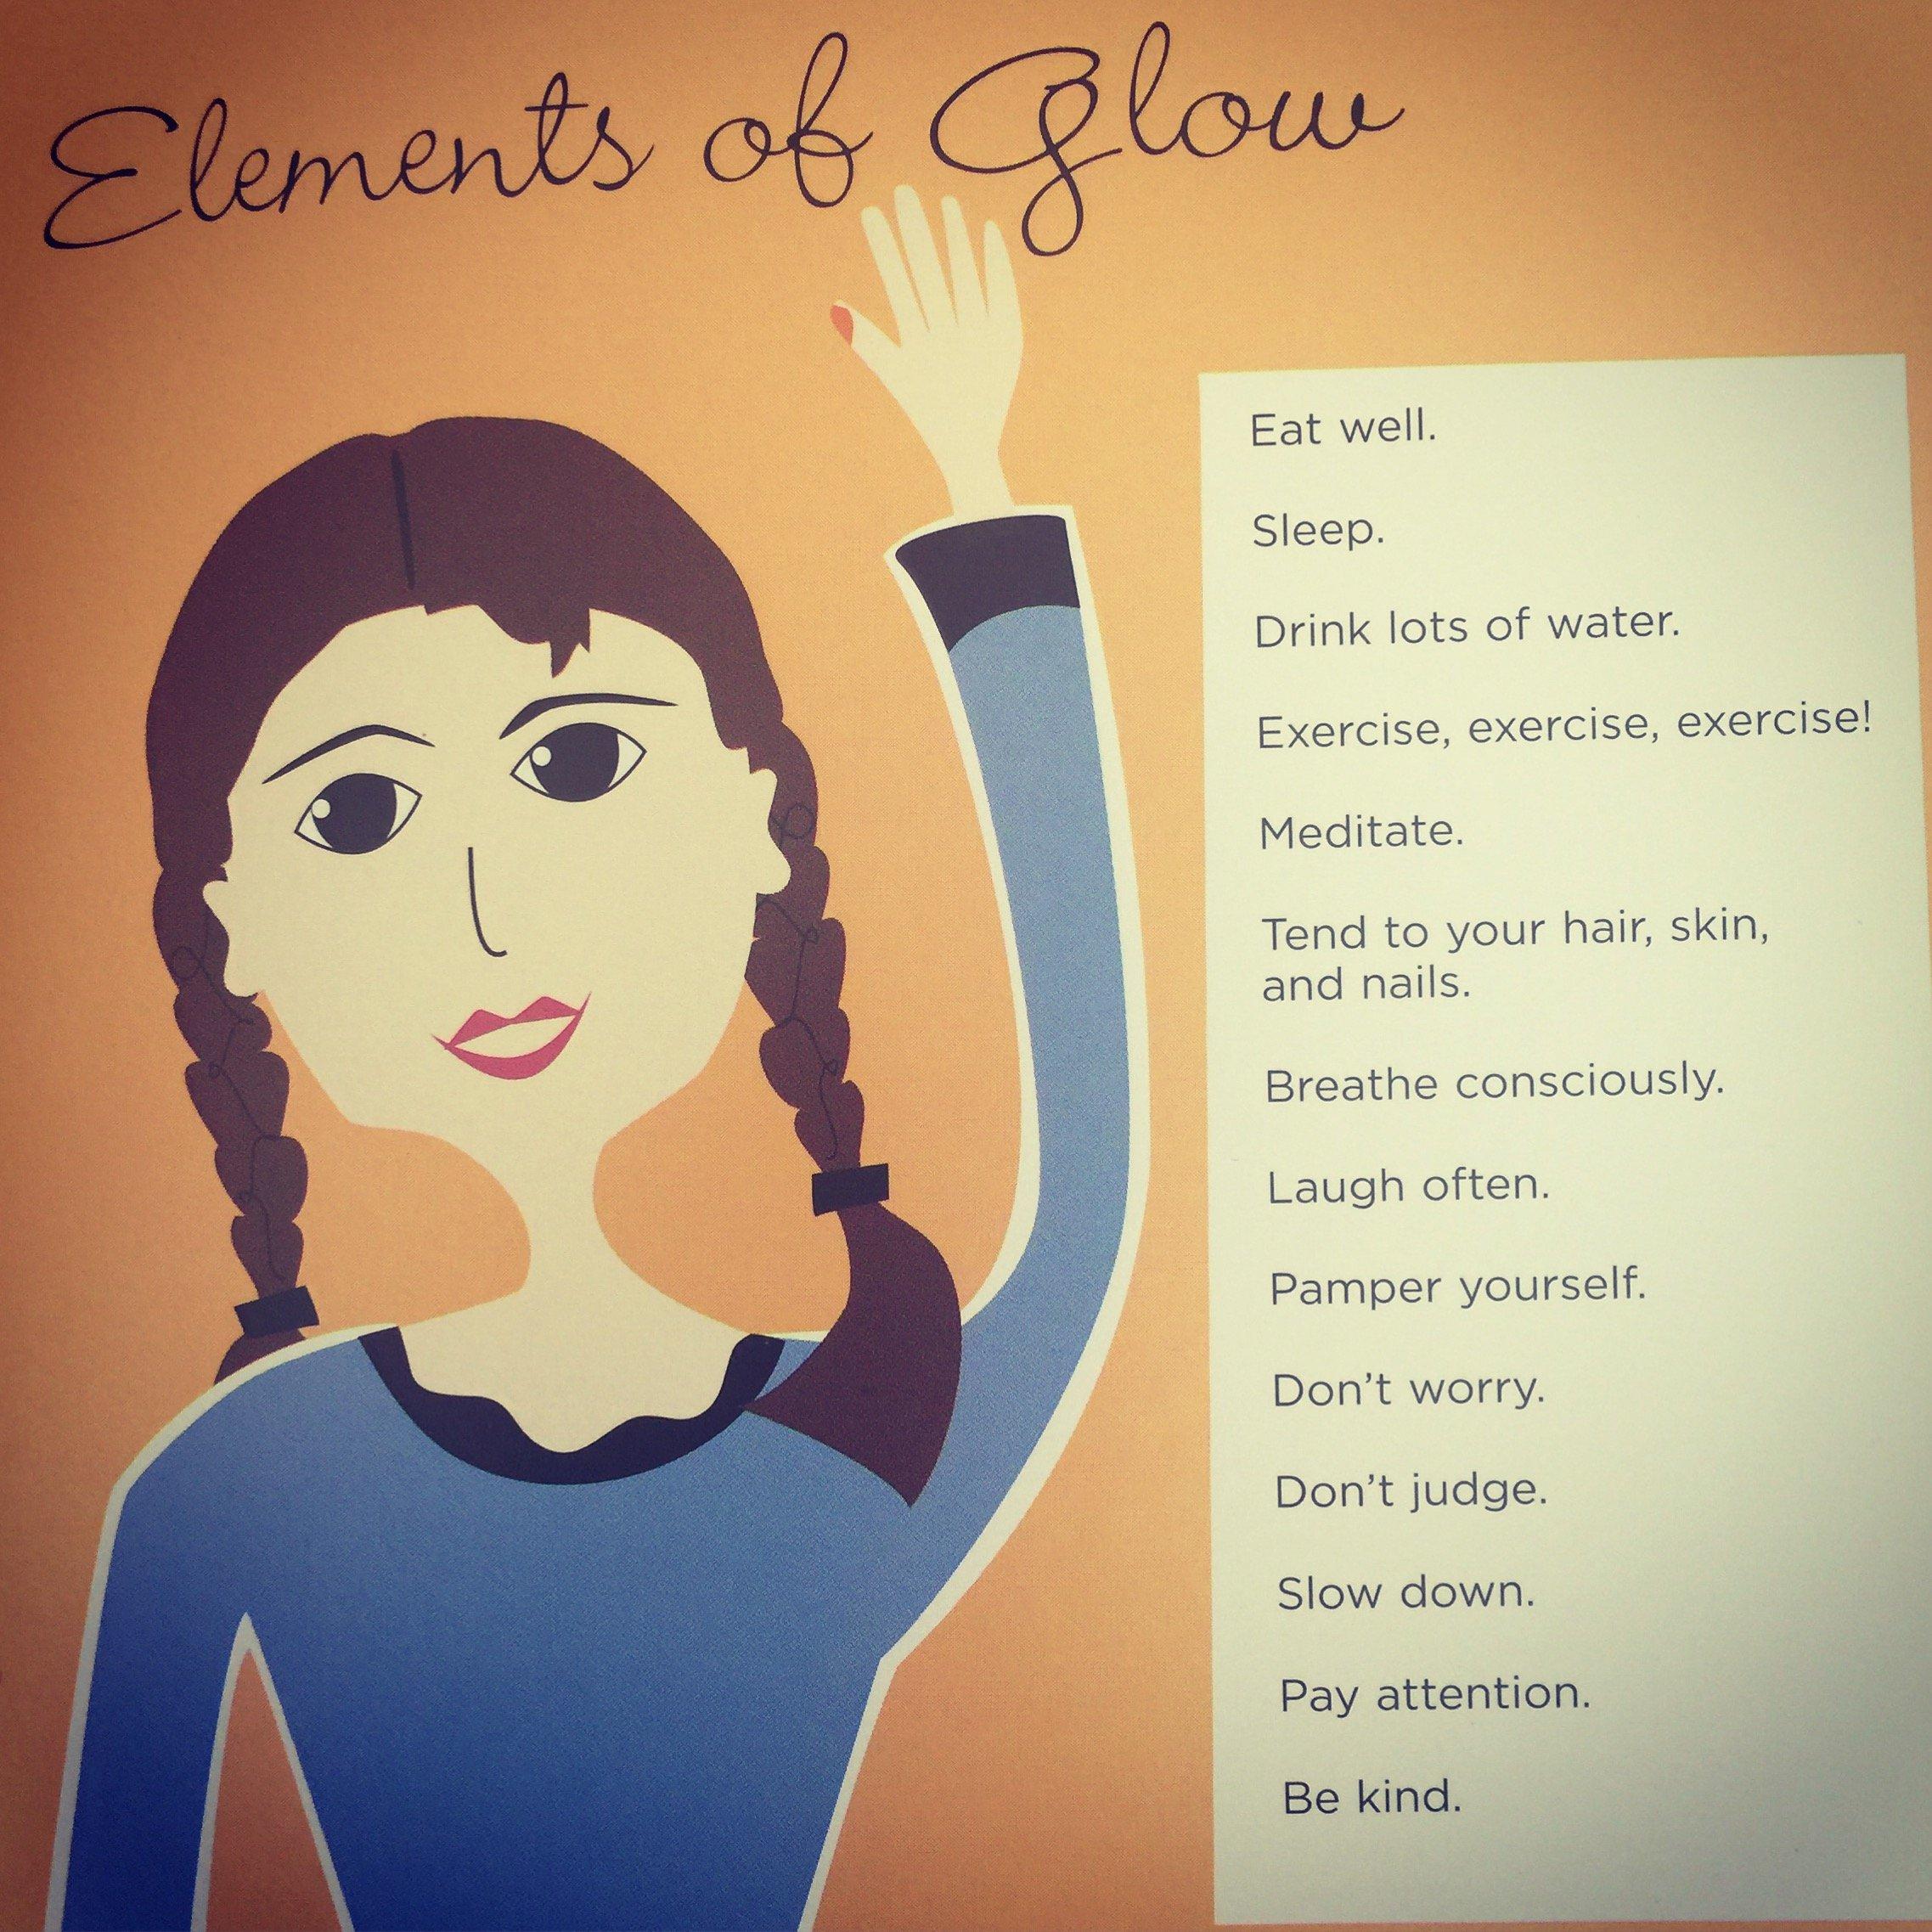 Elements of glow